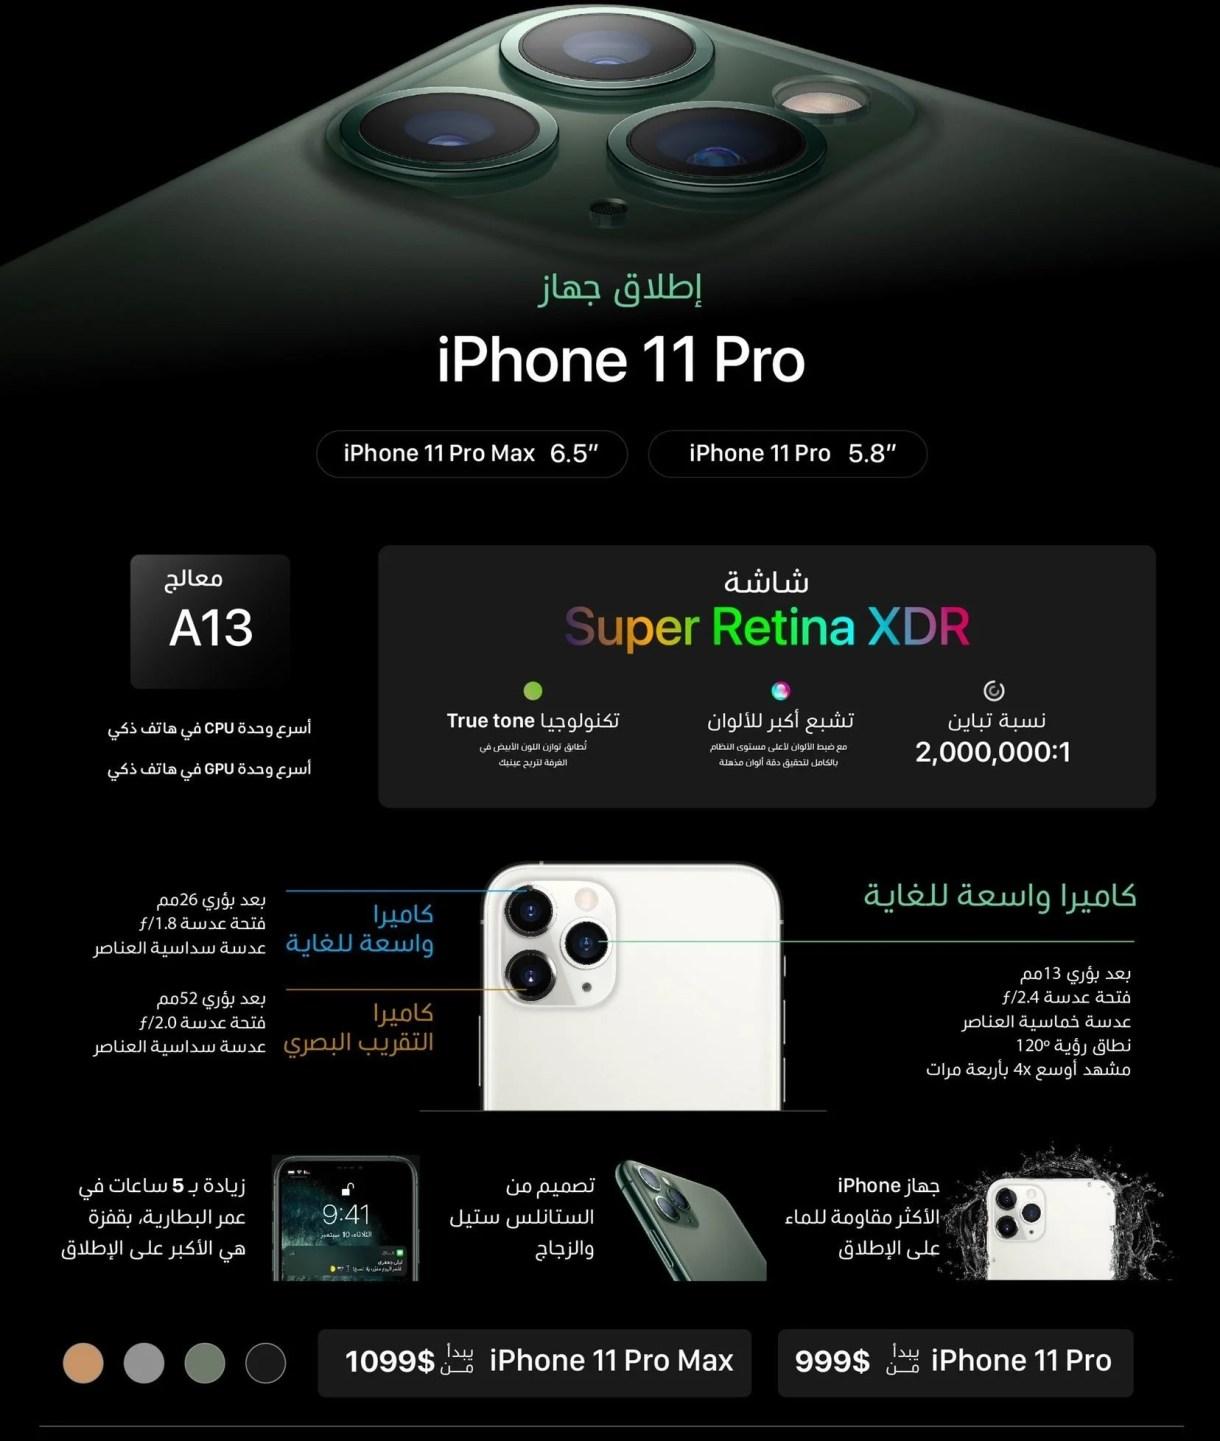 مواصفات و أسعار هواتف iPhone 11 Pro و iPhone 11 Pro Max